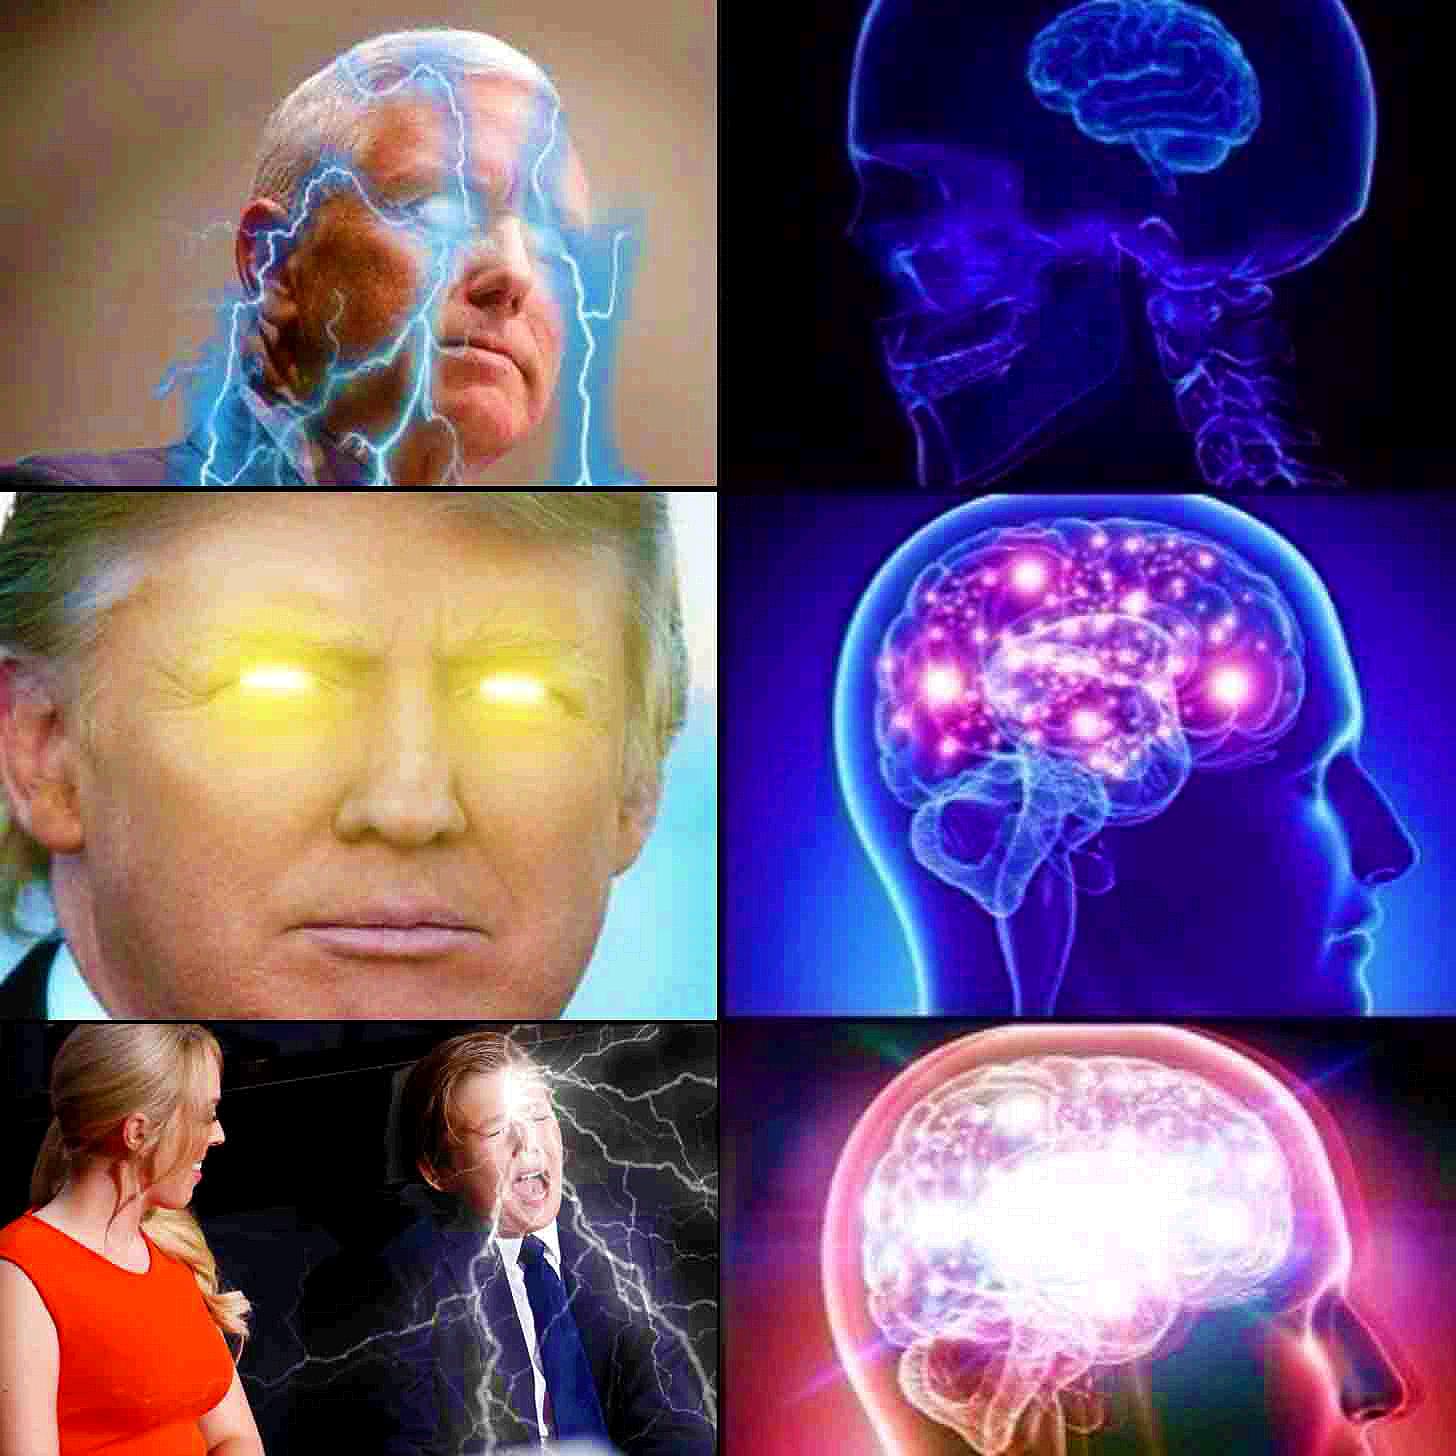 Meme Mastermind Bee Movie Memes Memes Manly Man Meme